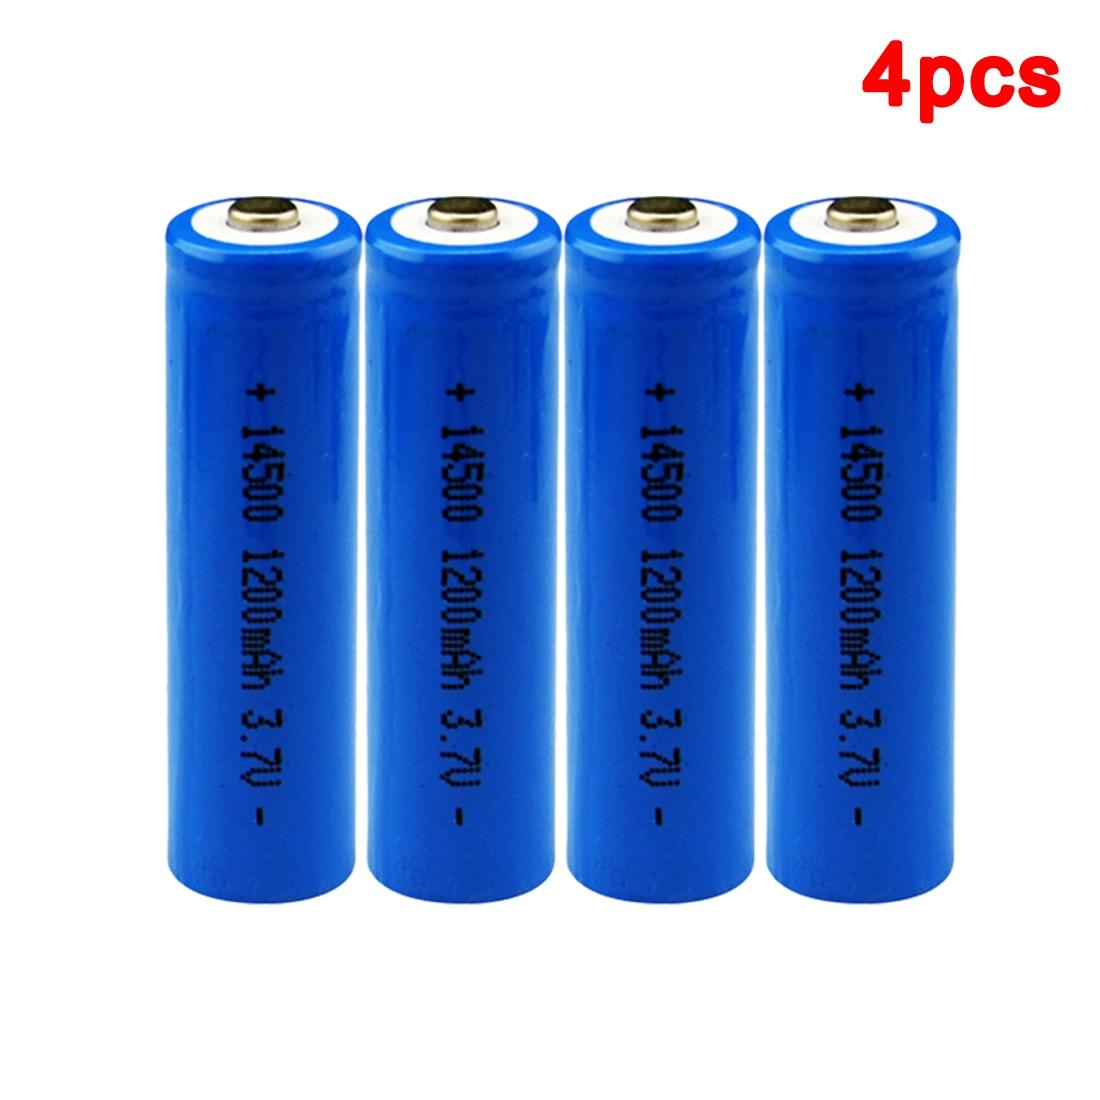 centechia Top Sale 4 pcs High Capacitance 14500 Battery 3.7V 1300mAh Rechargeable Battery for Led Flashlight Batery Battery est